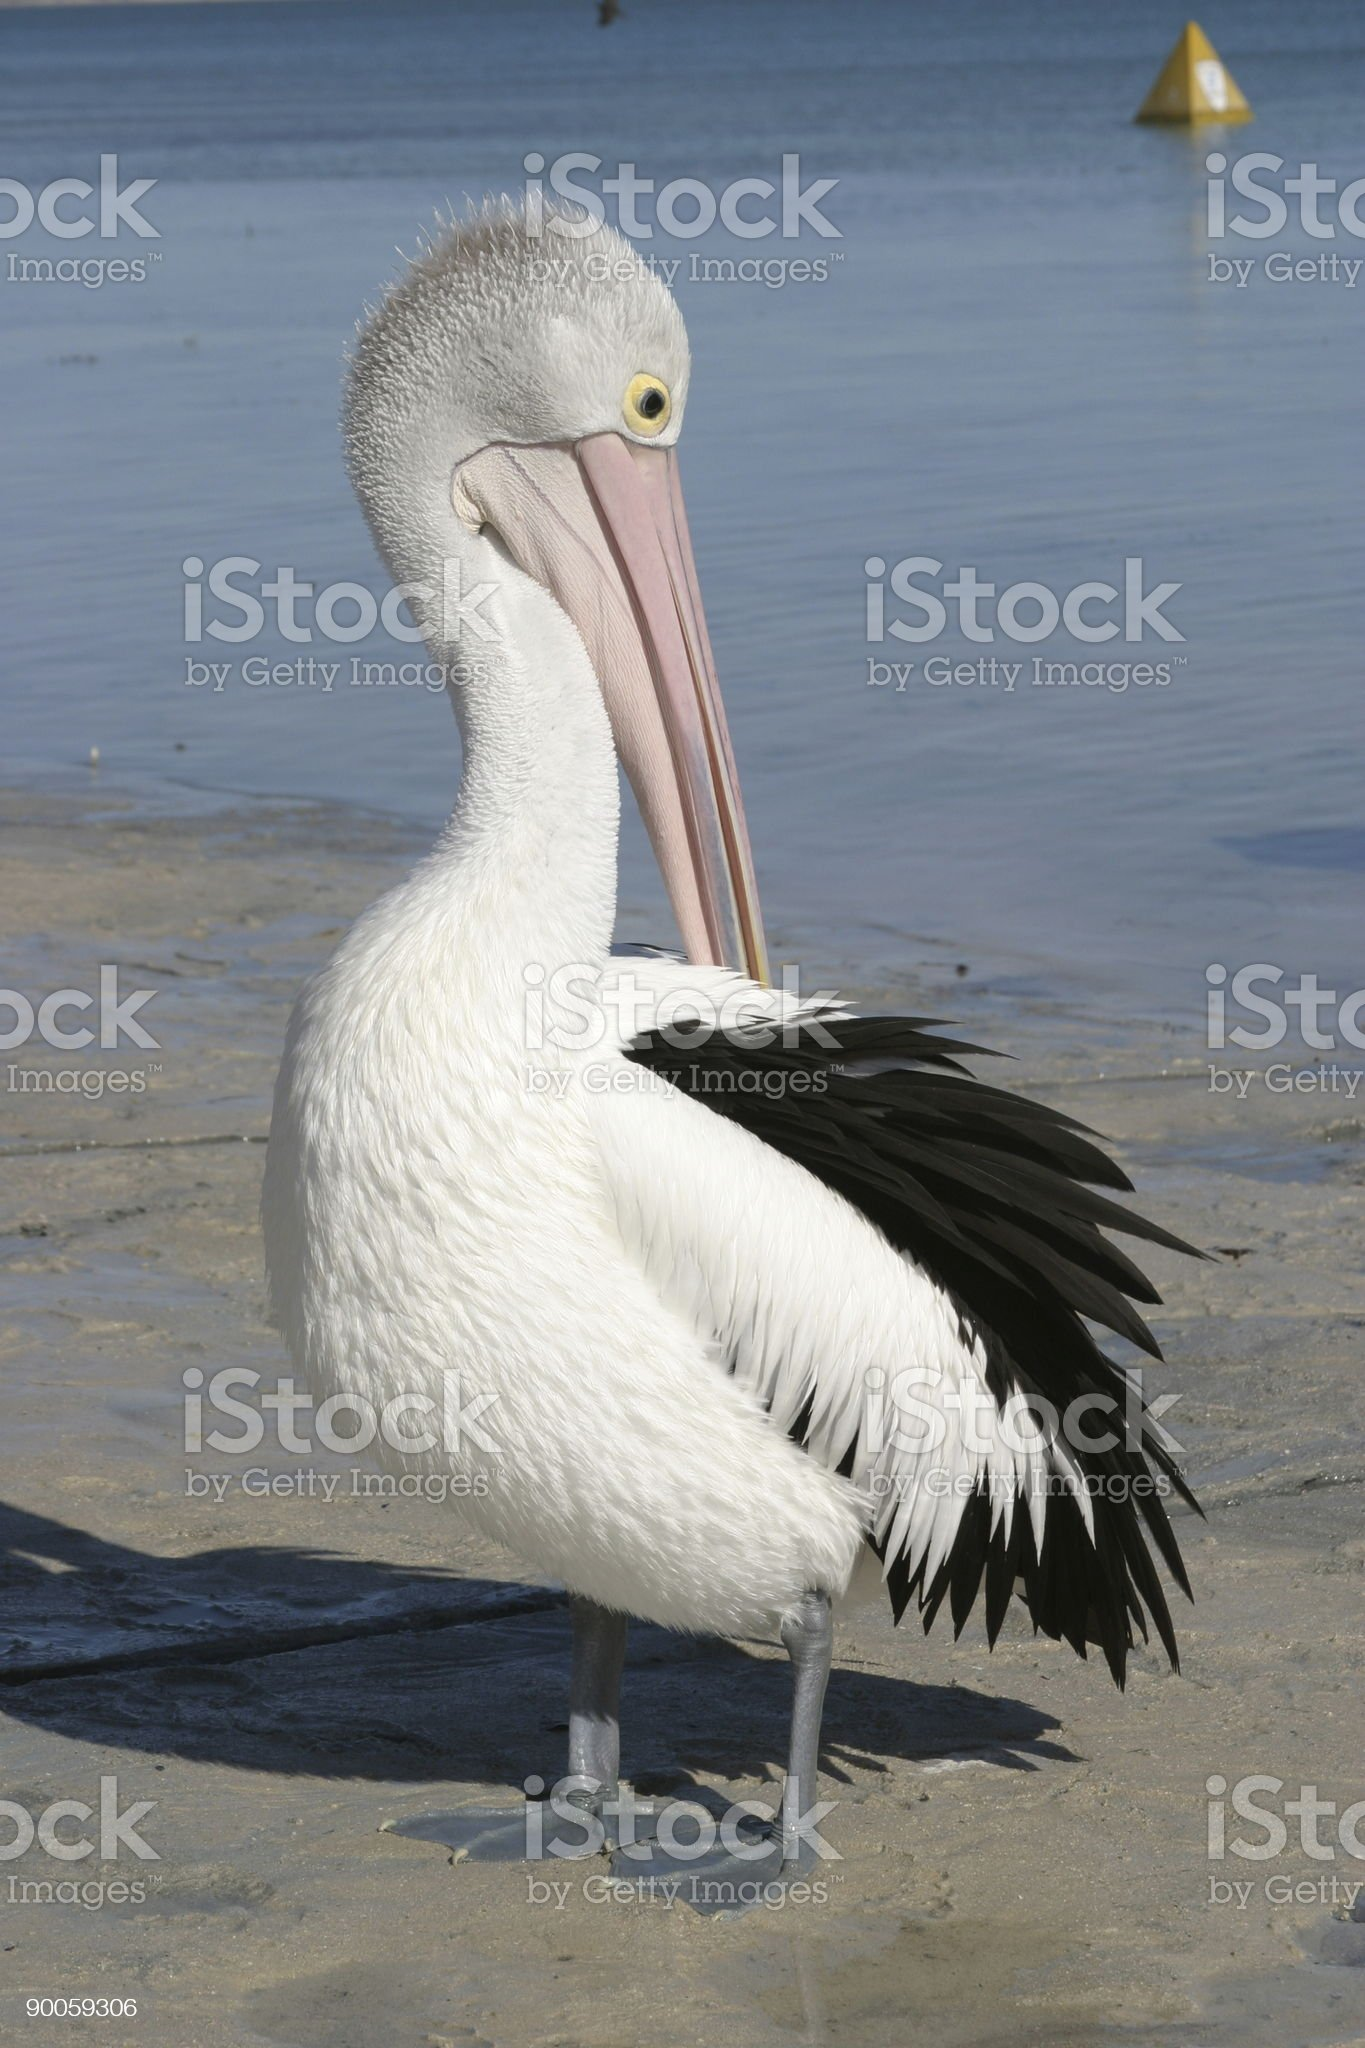 Pelican  on beach royalty-free stock photo